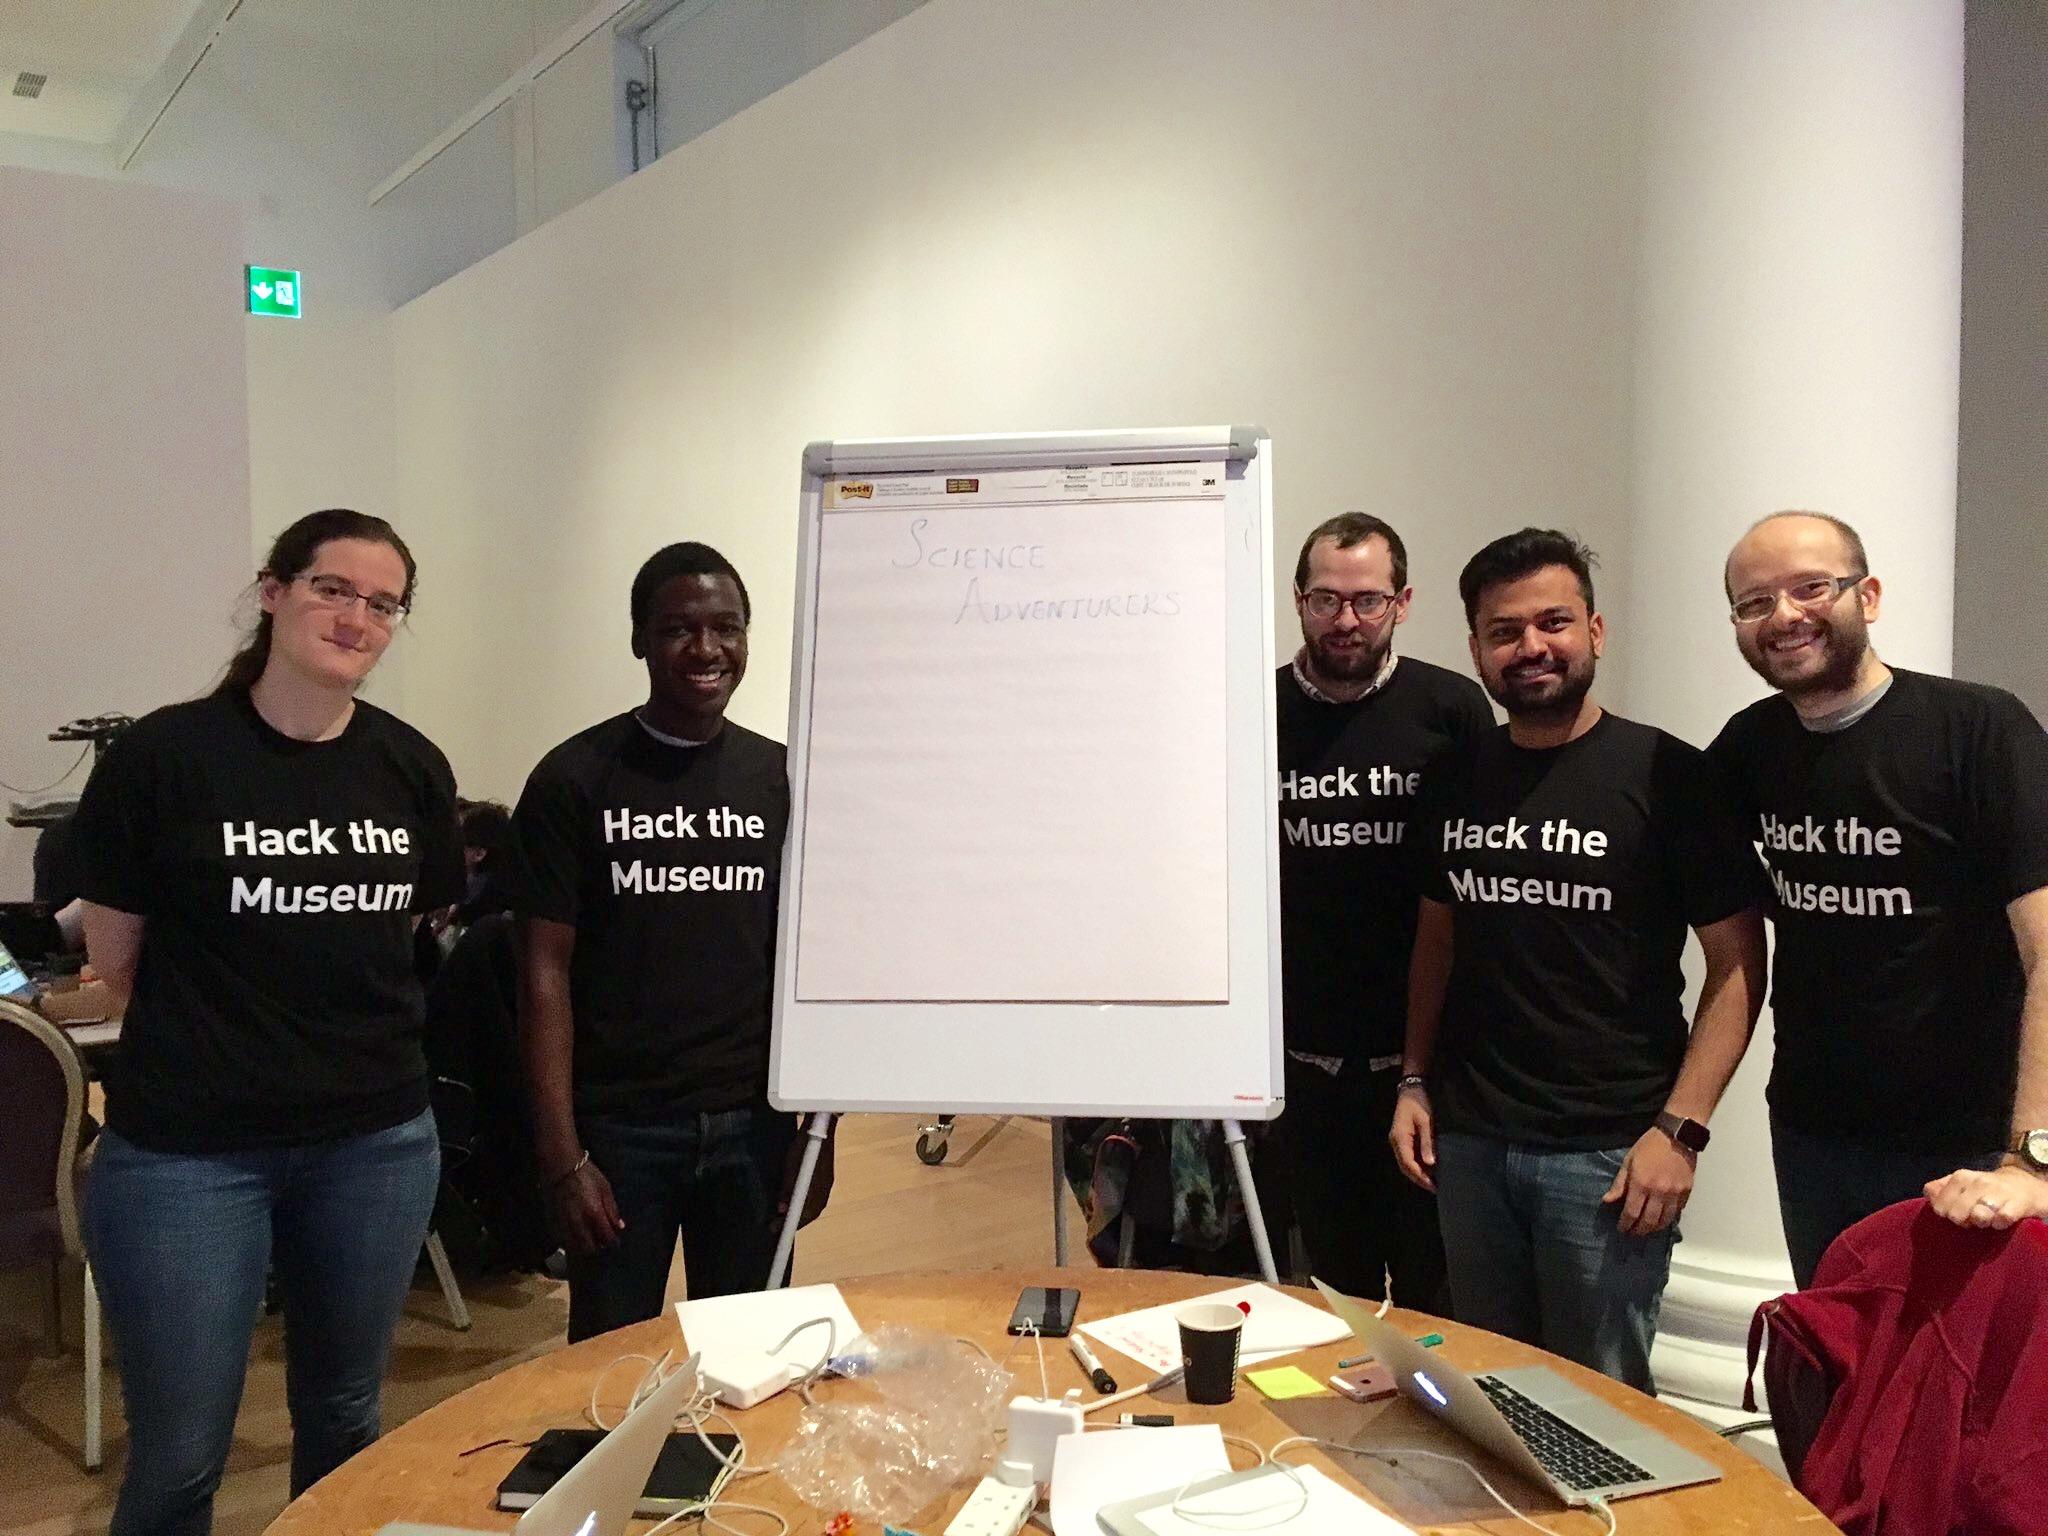 Science Musuem Hackathon